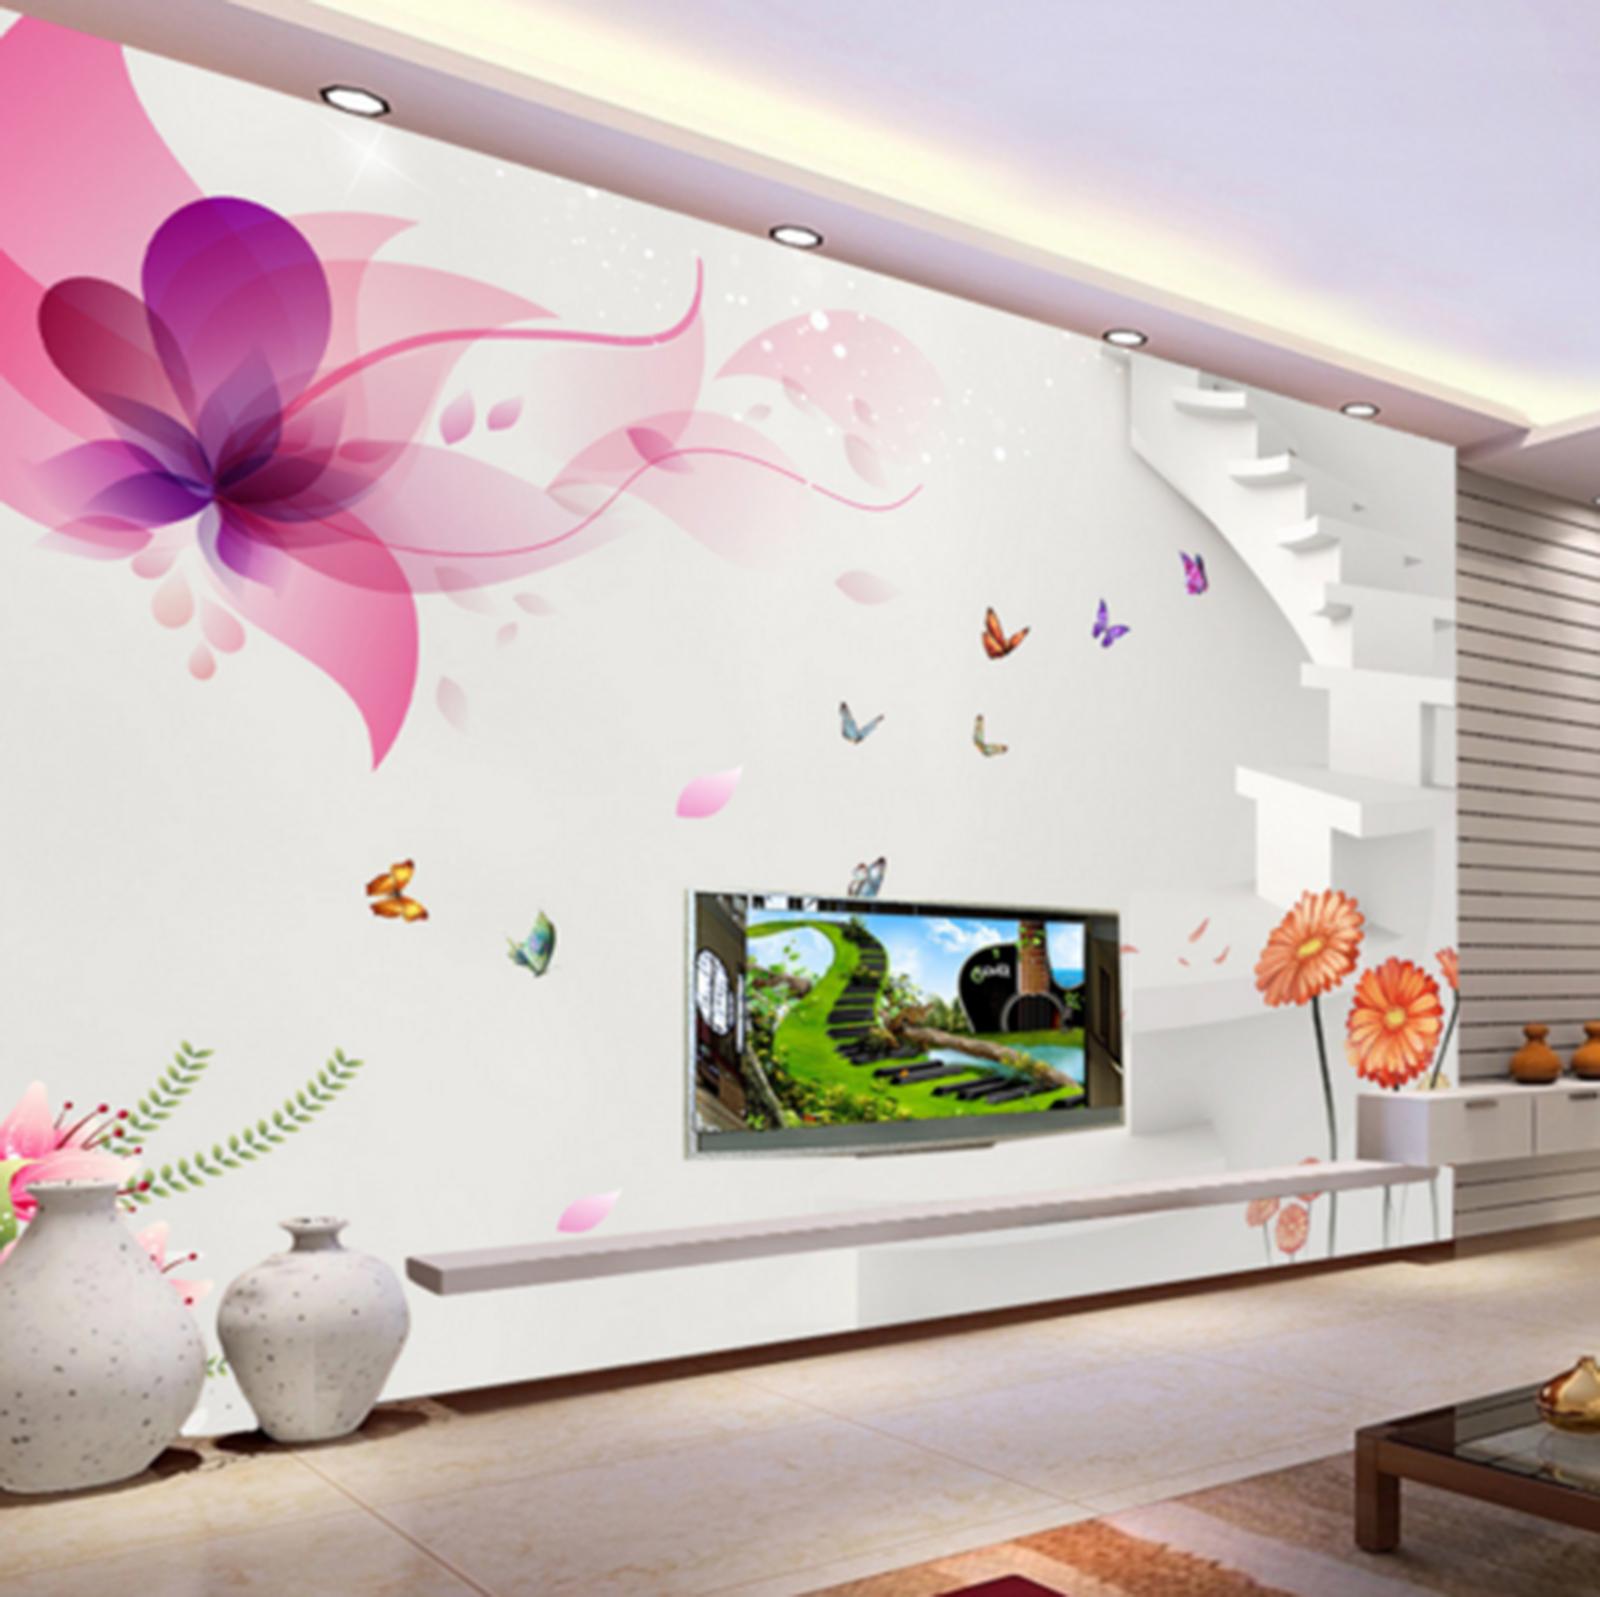 3D Paint Petals 5067 Wallpaper Murals Wall Print Wallpaper Mural AJ WALL UK Kyra